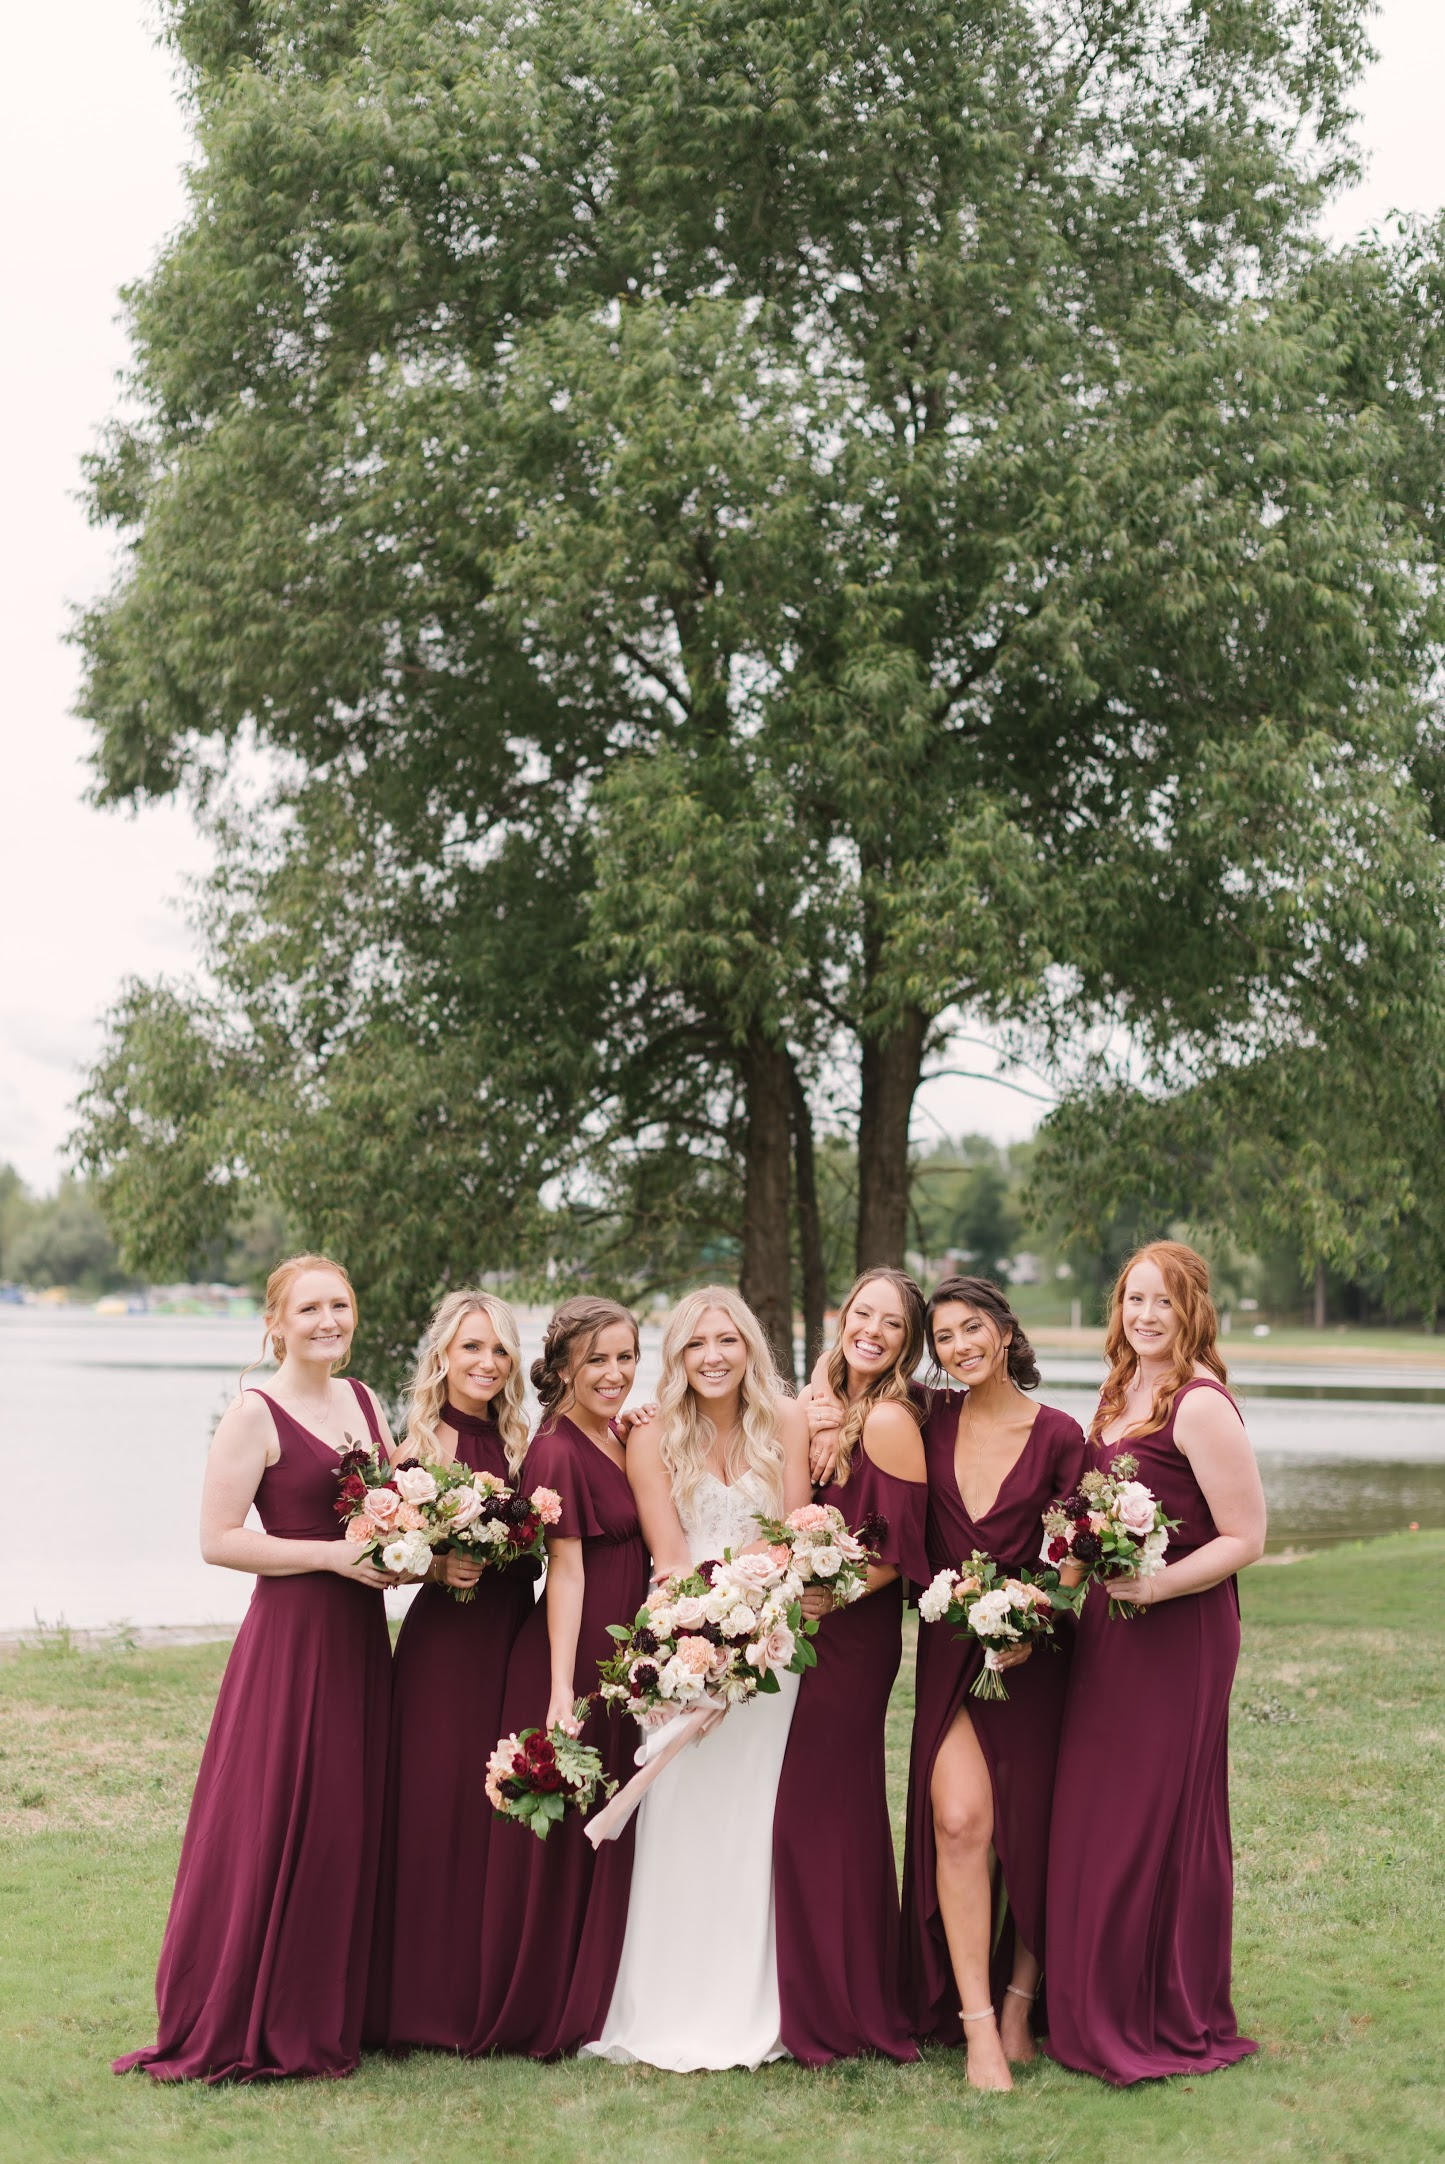 Field-Gems-Photography-Detroit-Michigan-Wedding-Photographer-Family-Photographer-Photobooth-090818-399.jpg